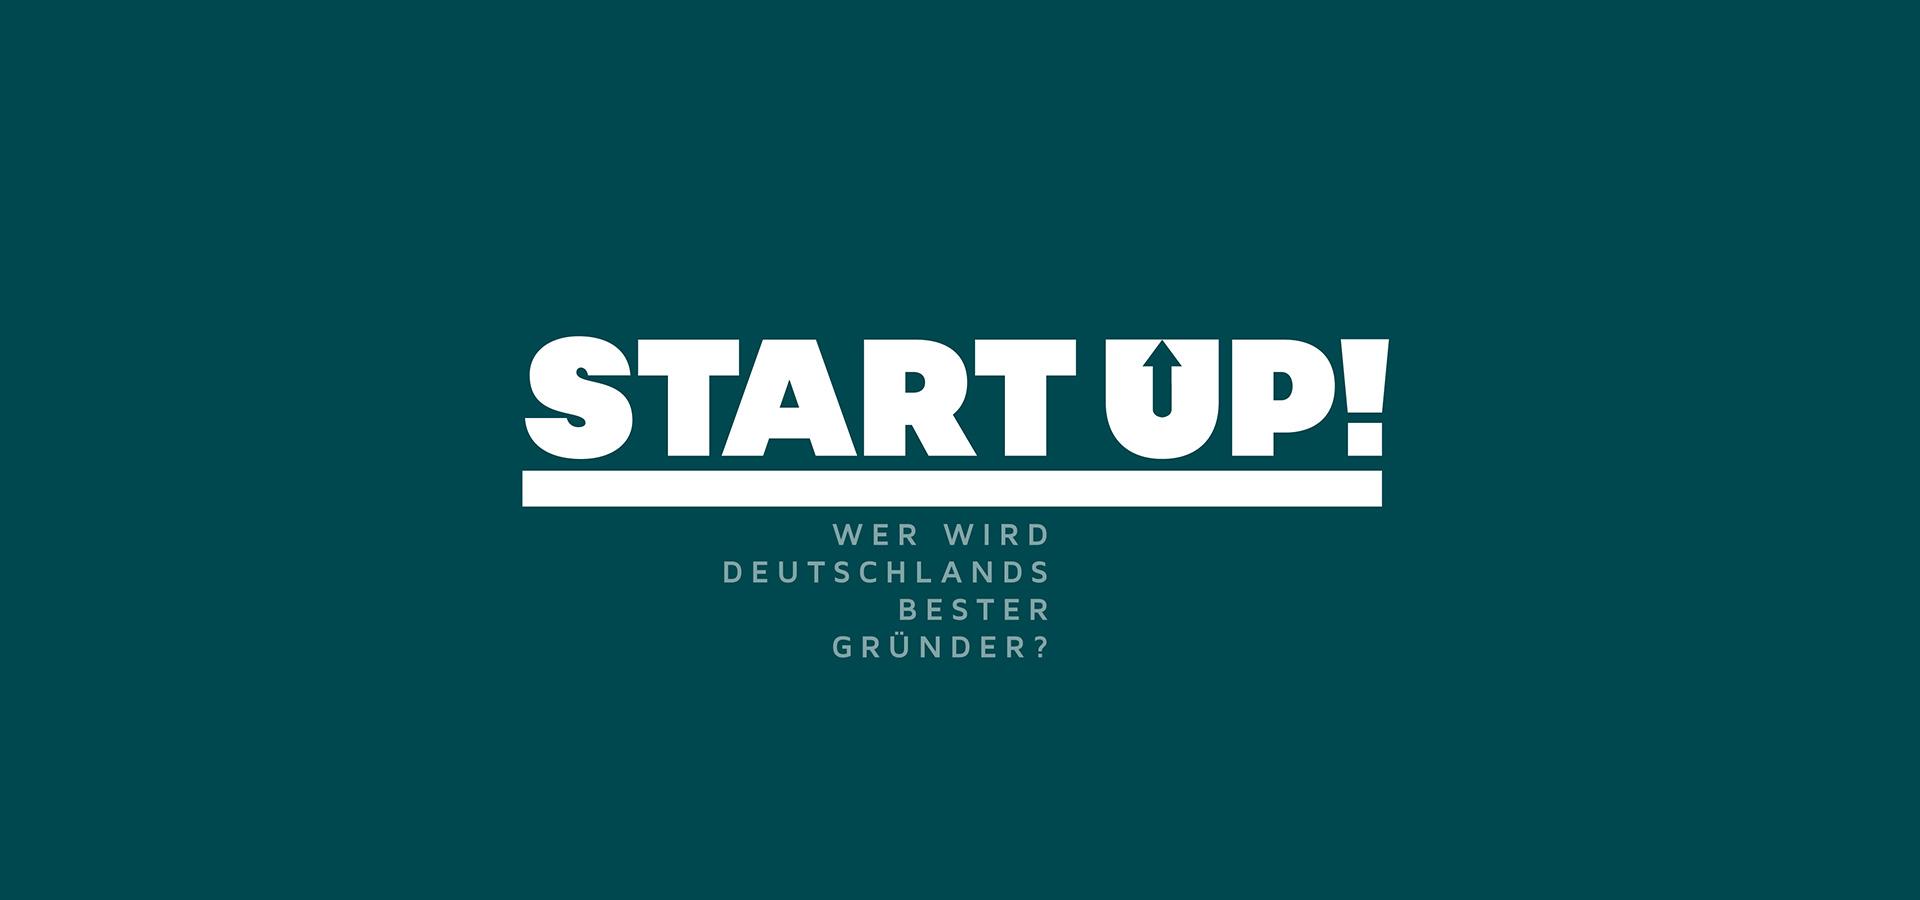 startup1_top.jpg